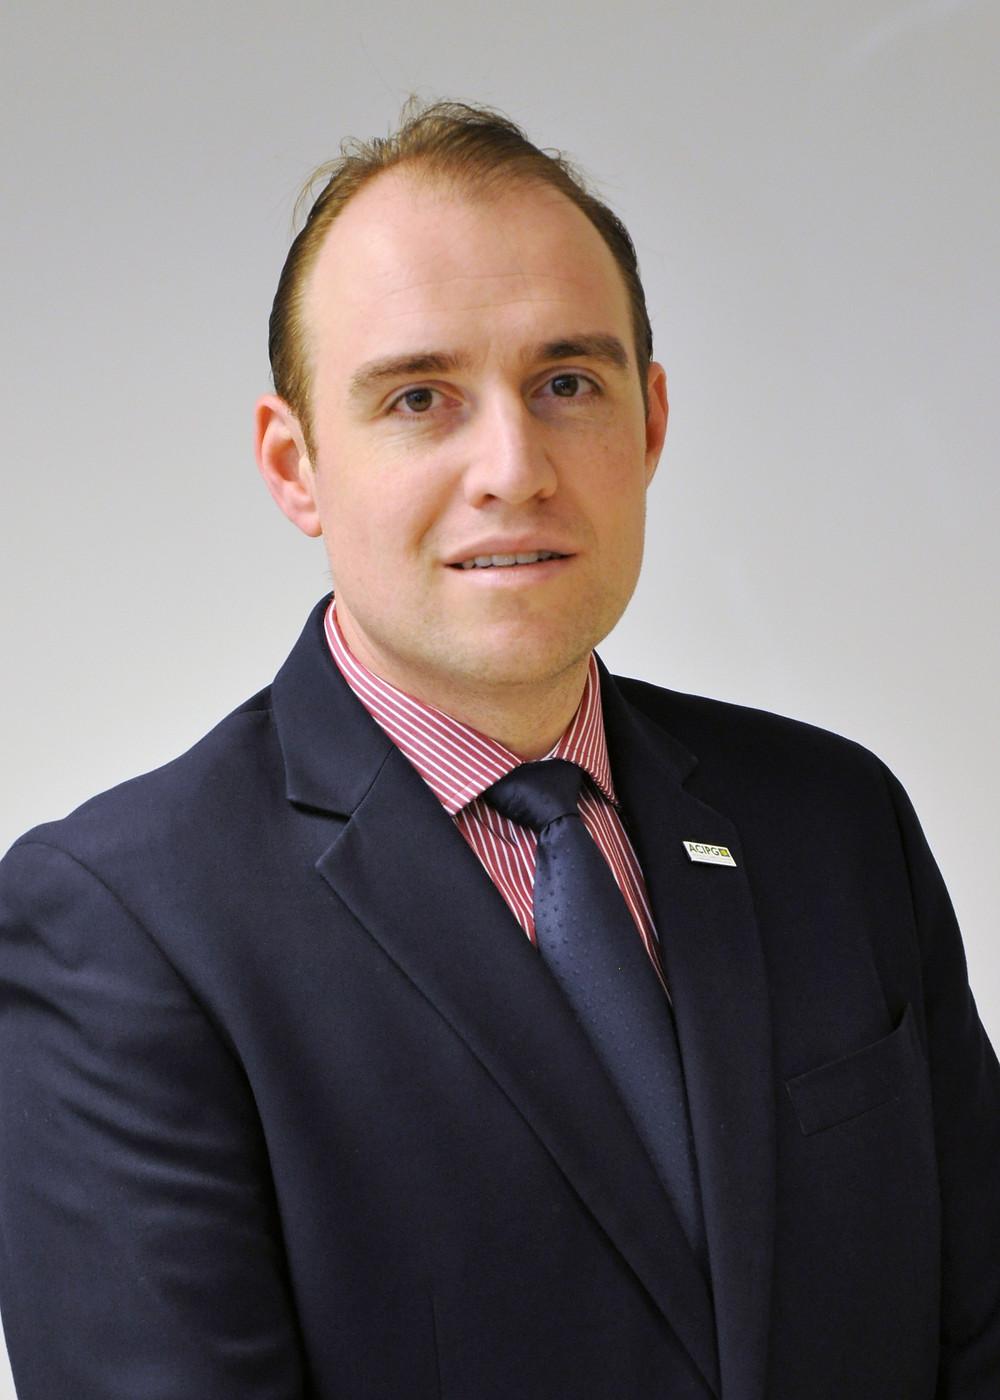 foto do presidente do Sindicato, Daniel Wagner